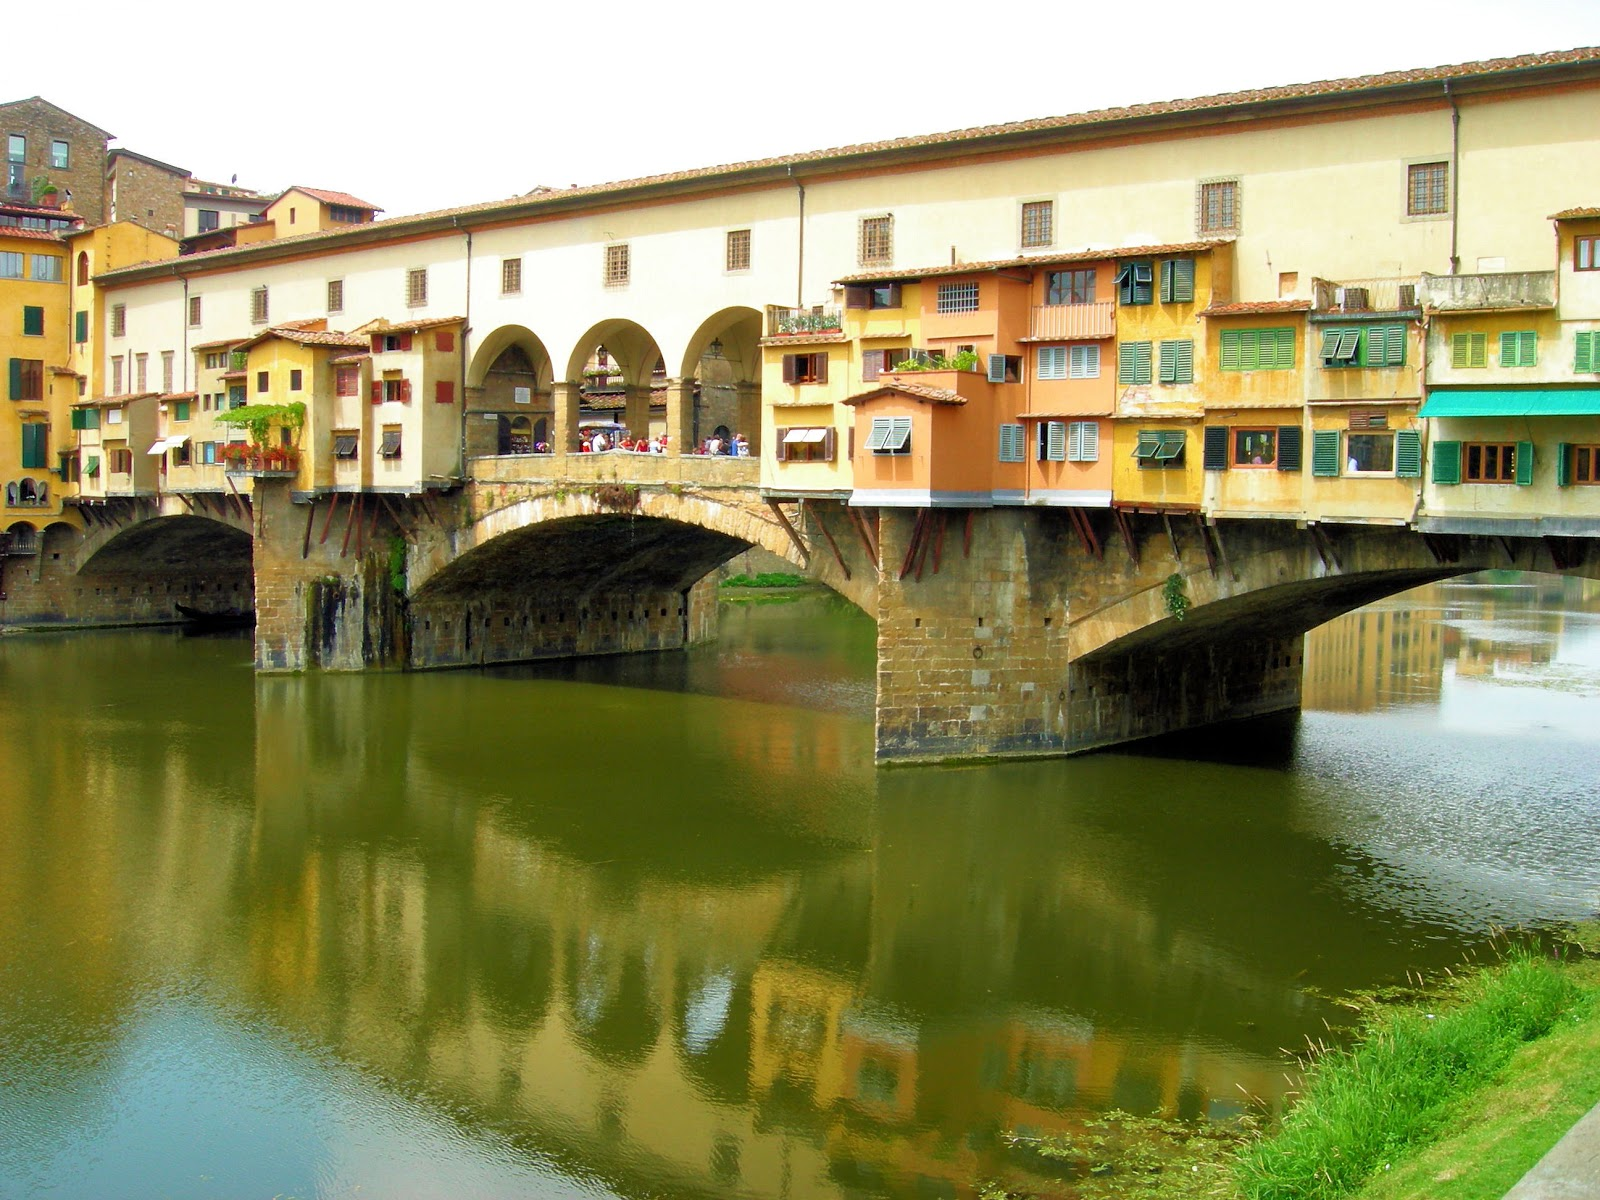 http://4.bp.blogspot.com/_tcIVt392thQ/S-gU7oKoPOI/AAAAAAAAAPw/ytZynsXEfjw/s1600/Ponte+Vecchio+Florence+BA.jpg